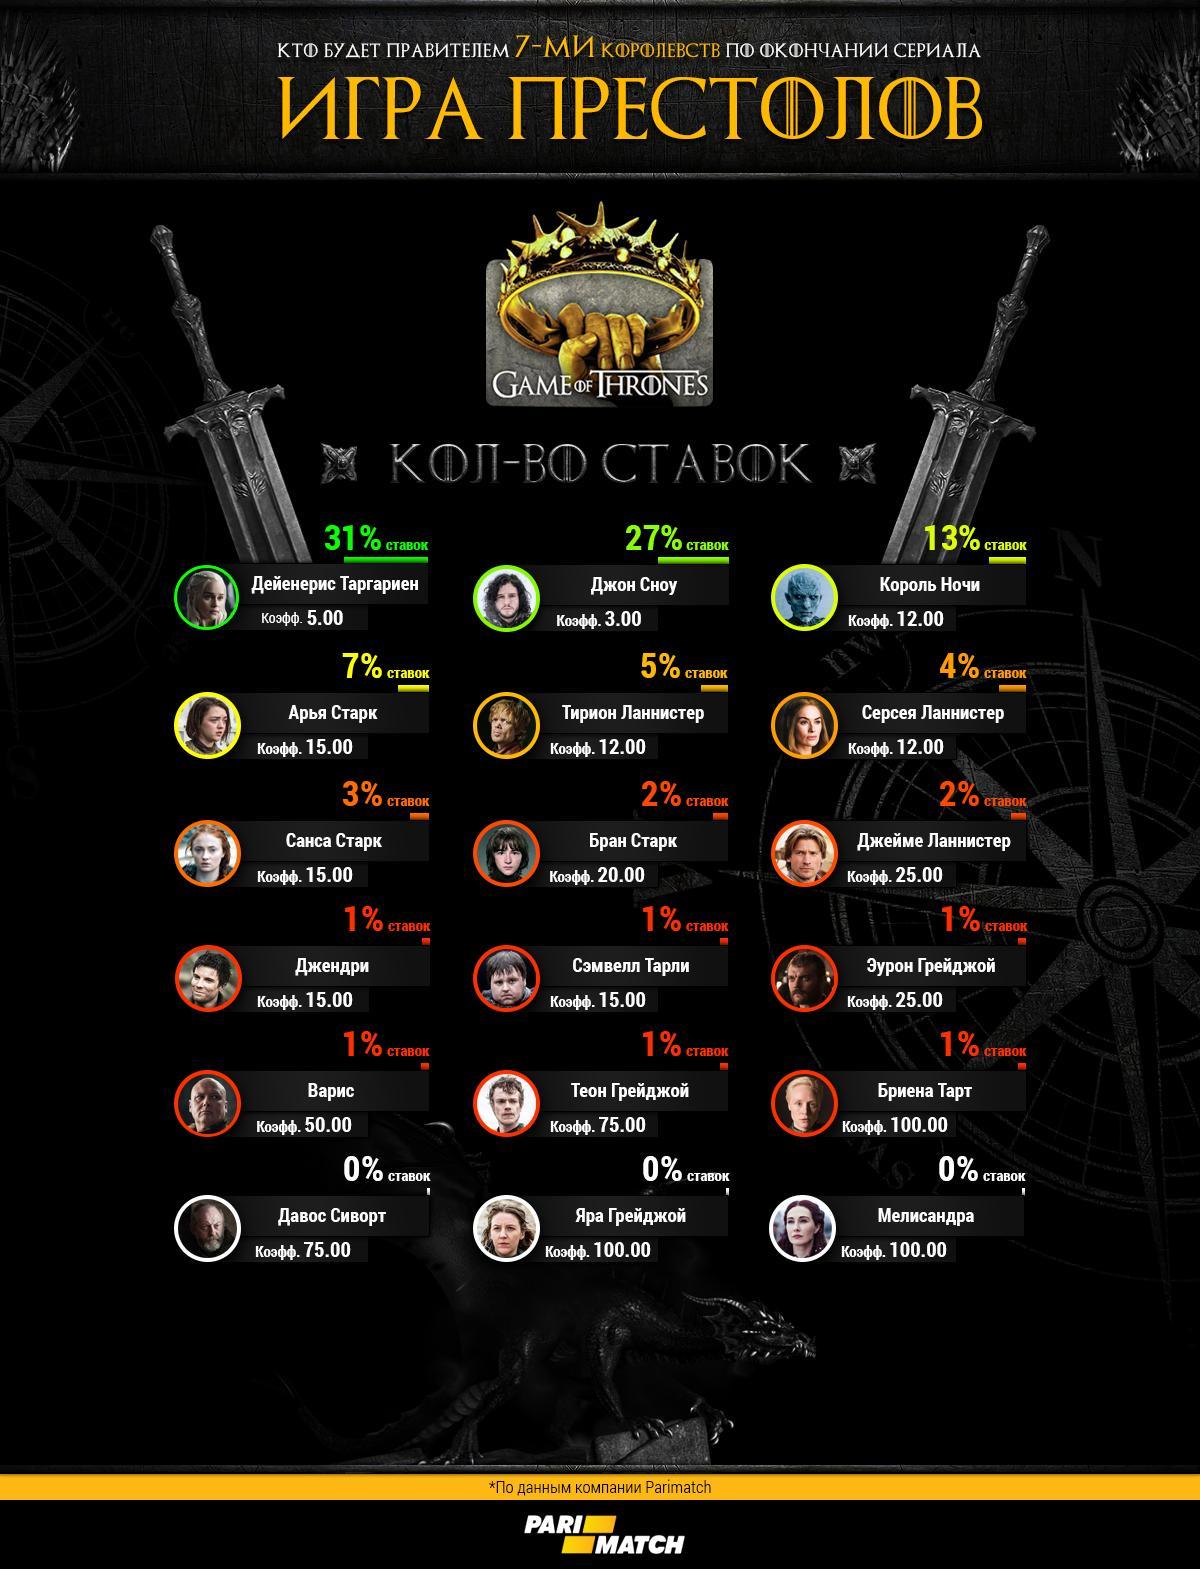 Ставки на Игру престолов